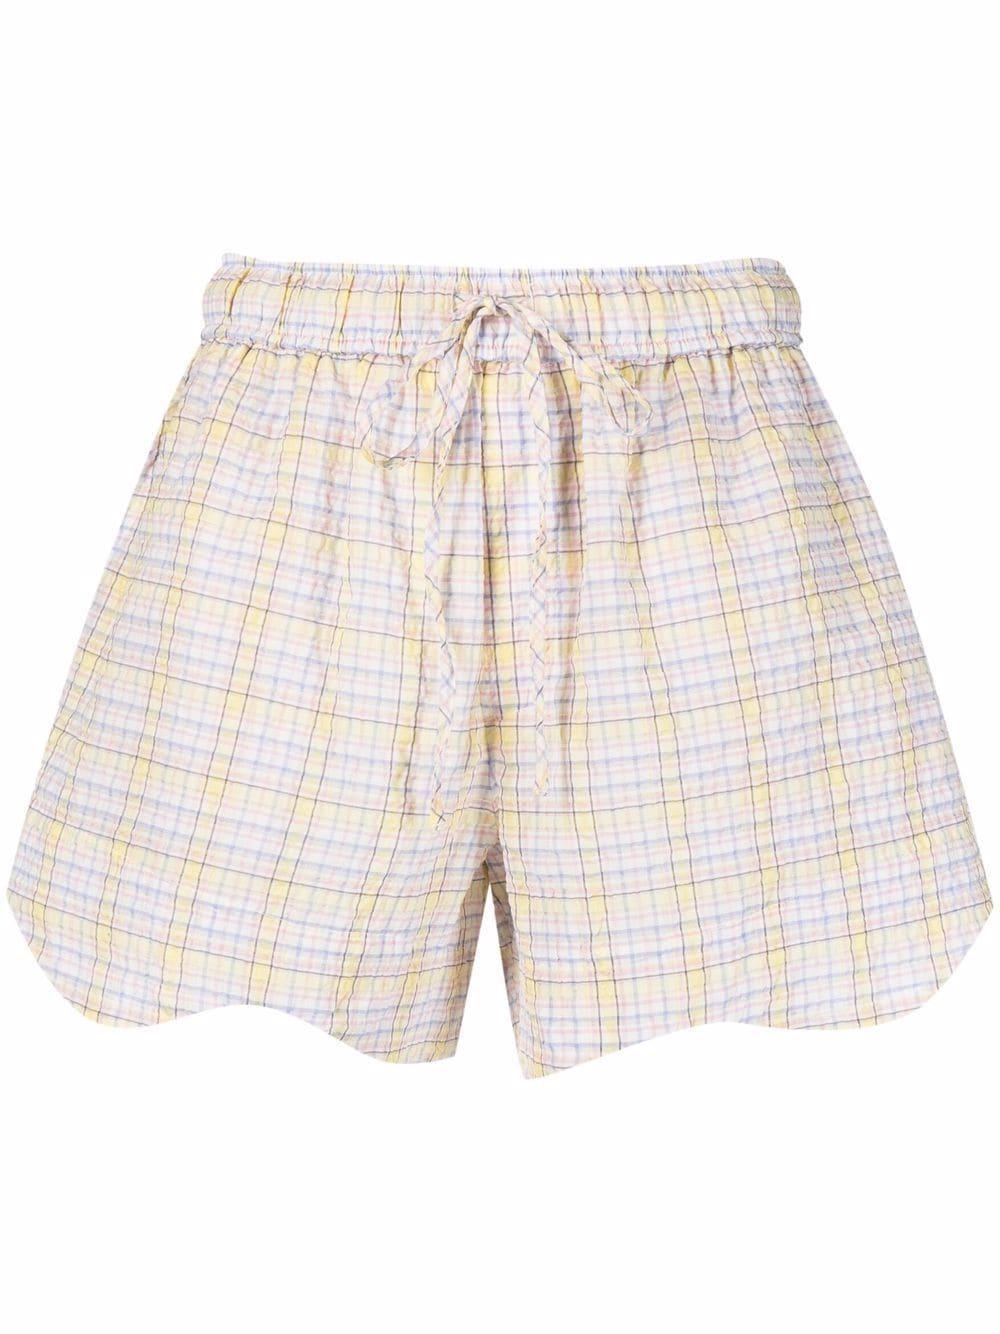 Seersucker Check Shorts Item # F6070